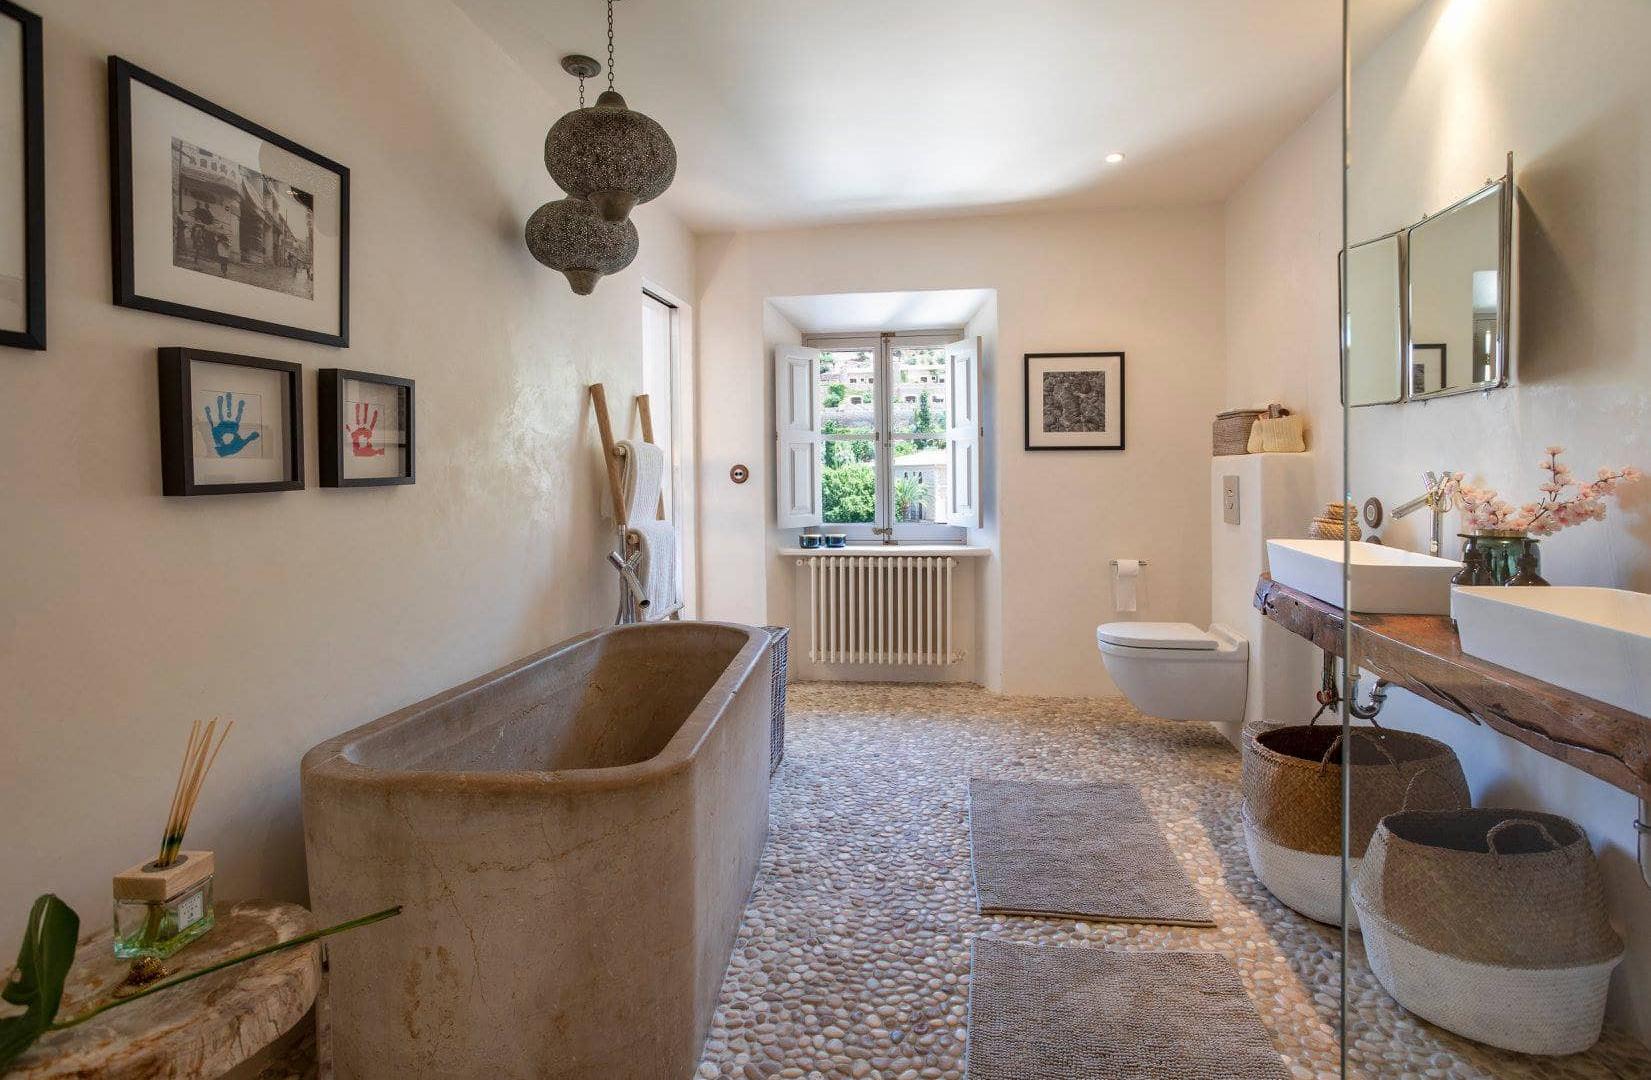 casa_nama_deia_toilet.jpg